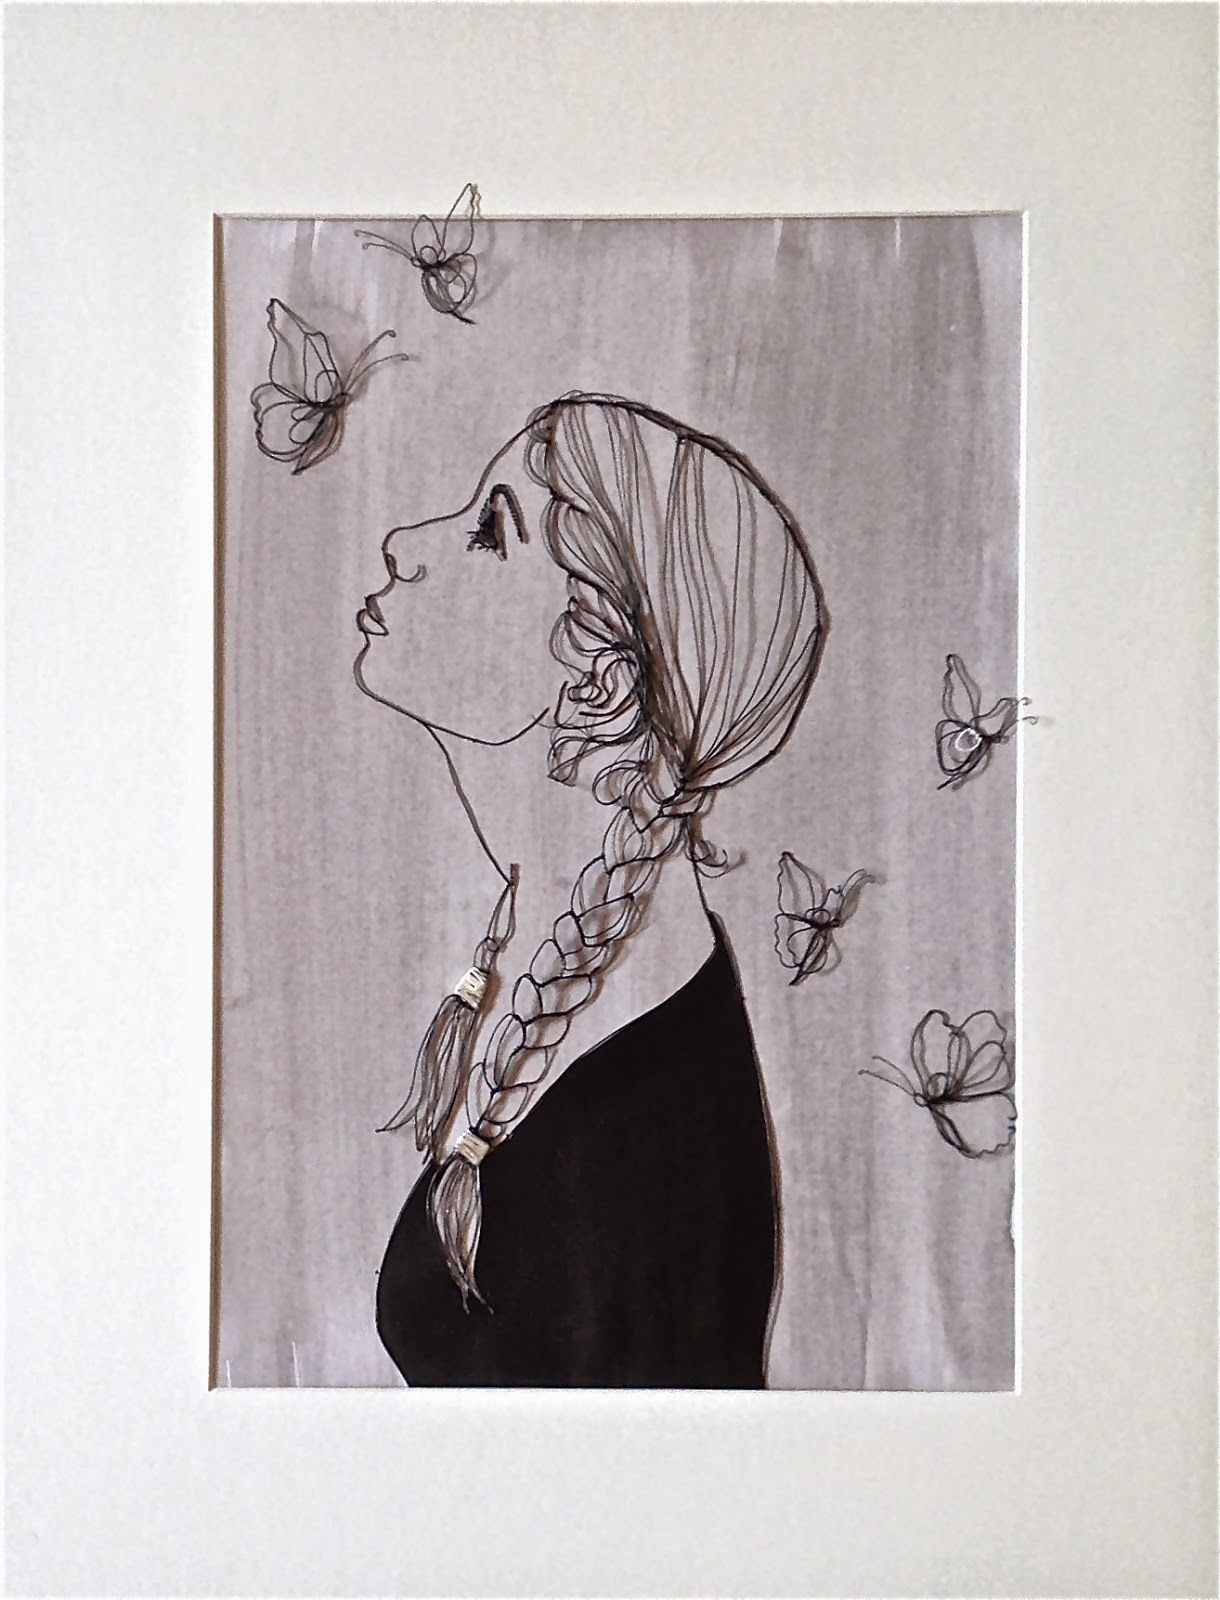 sculptural drawing by christina james nielsen: Presentation of ...